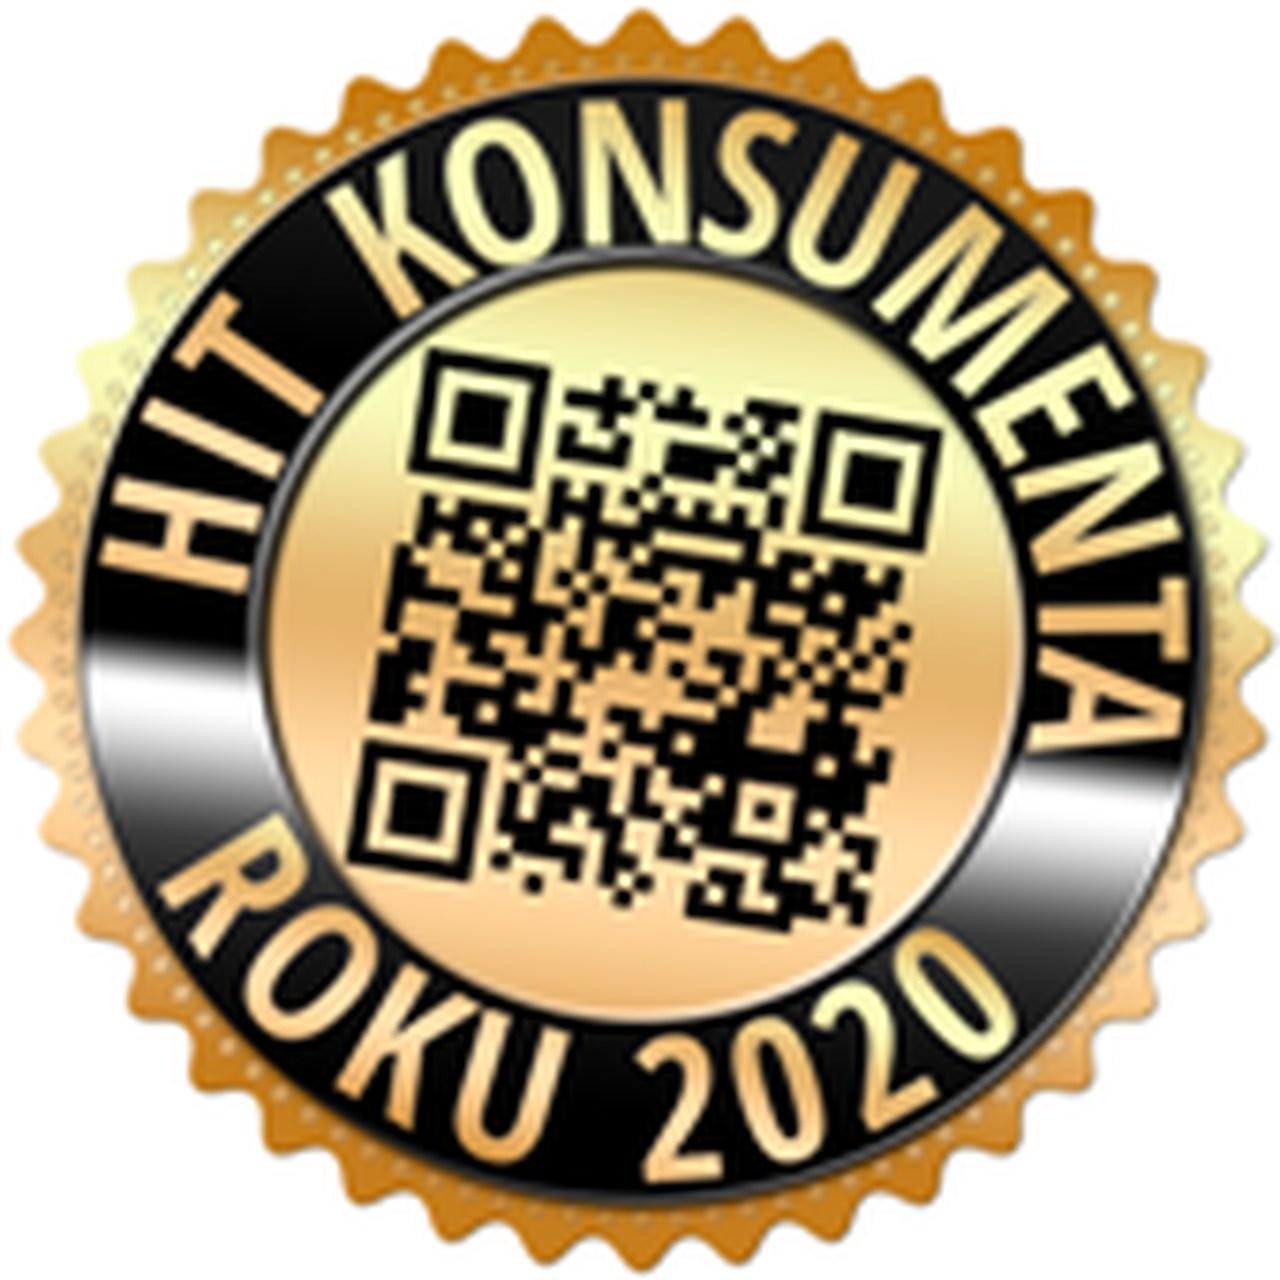 Fenix Hit Konsumenta Roku 2020